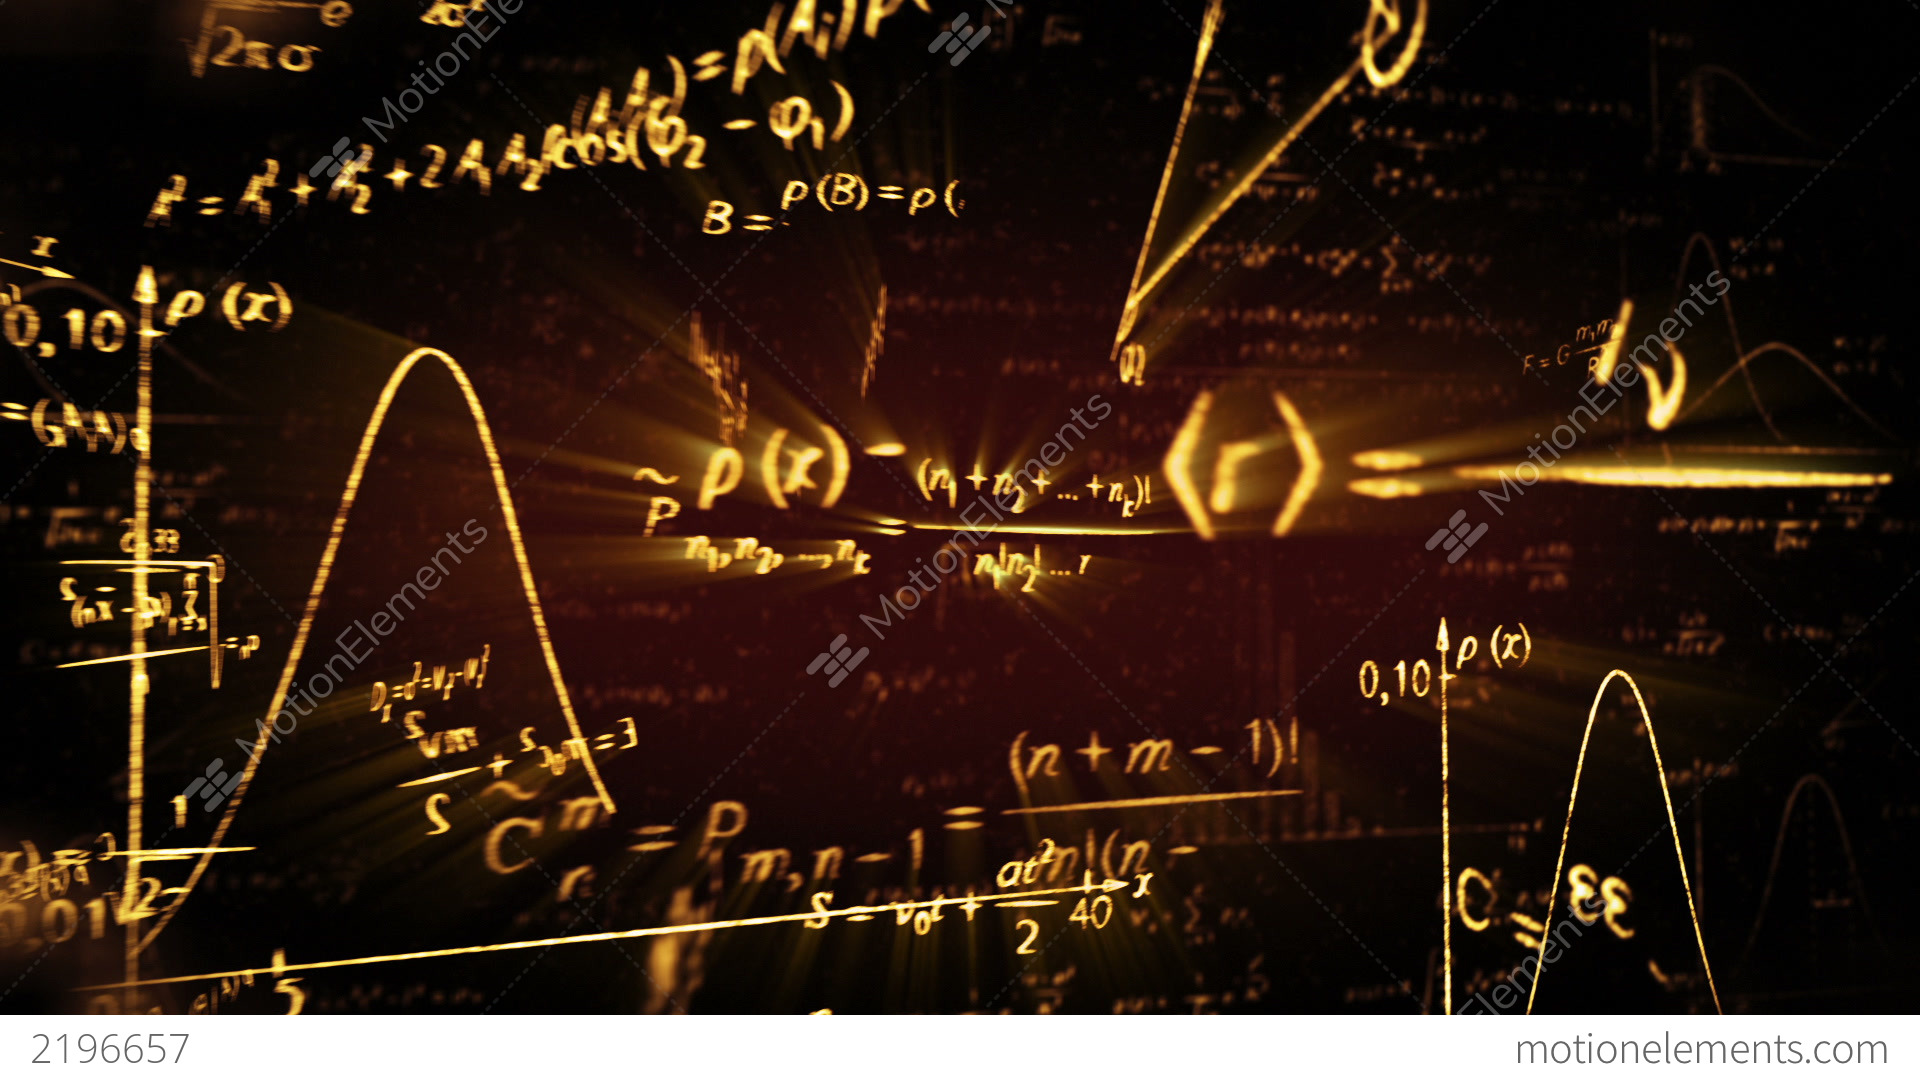 3d Weather Live Wallpaper Shining Physics Maths Formulas Loop Stock Animation 2196657